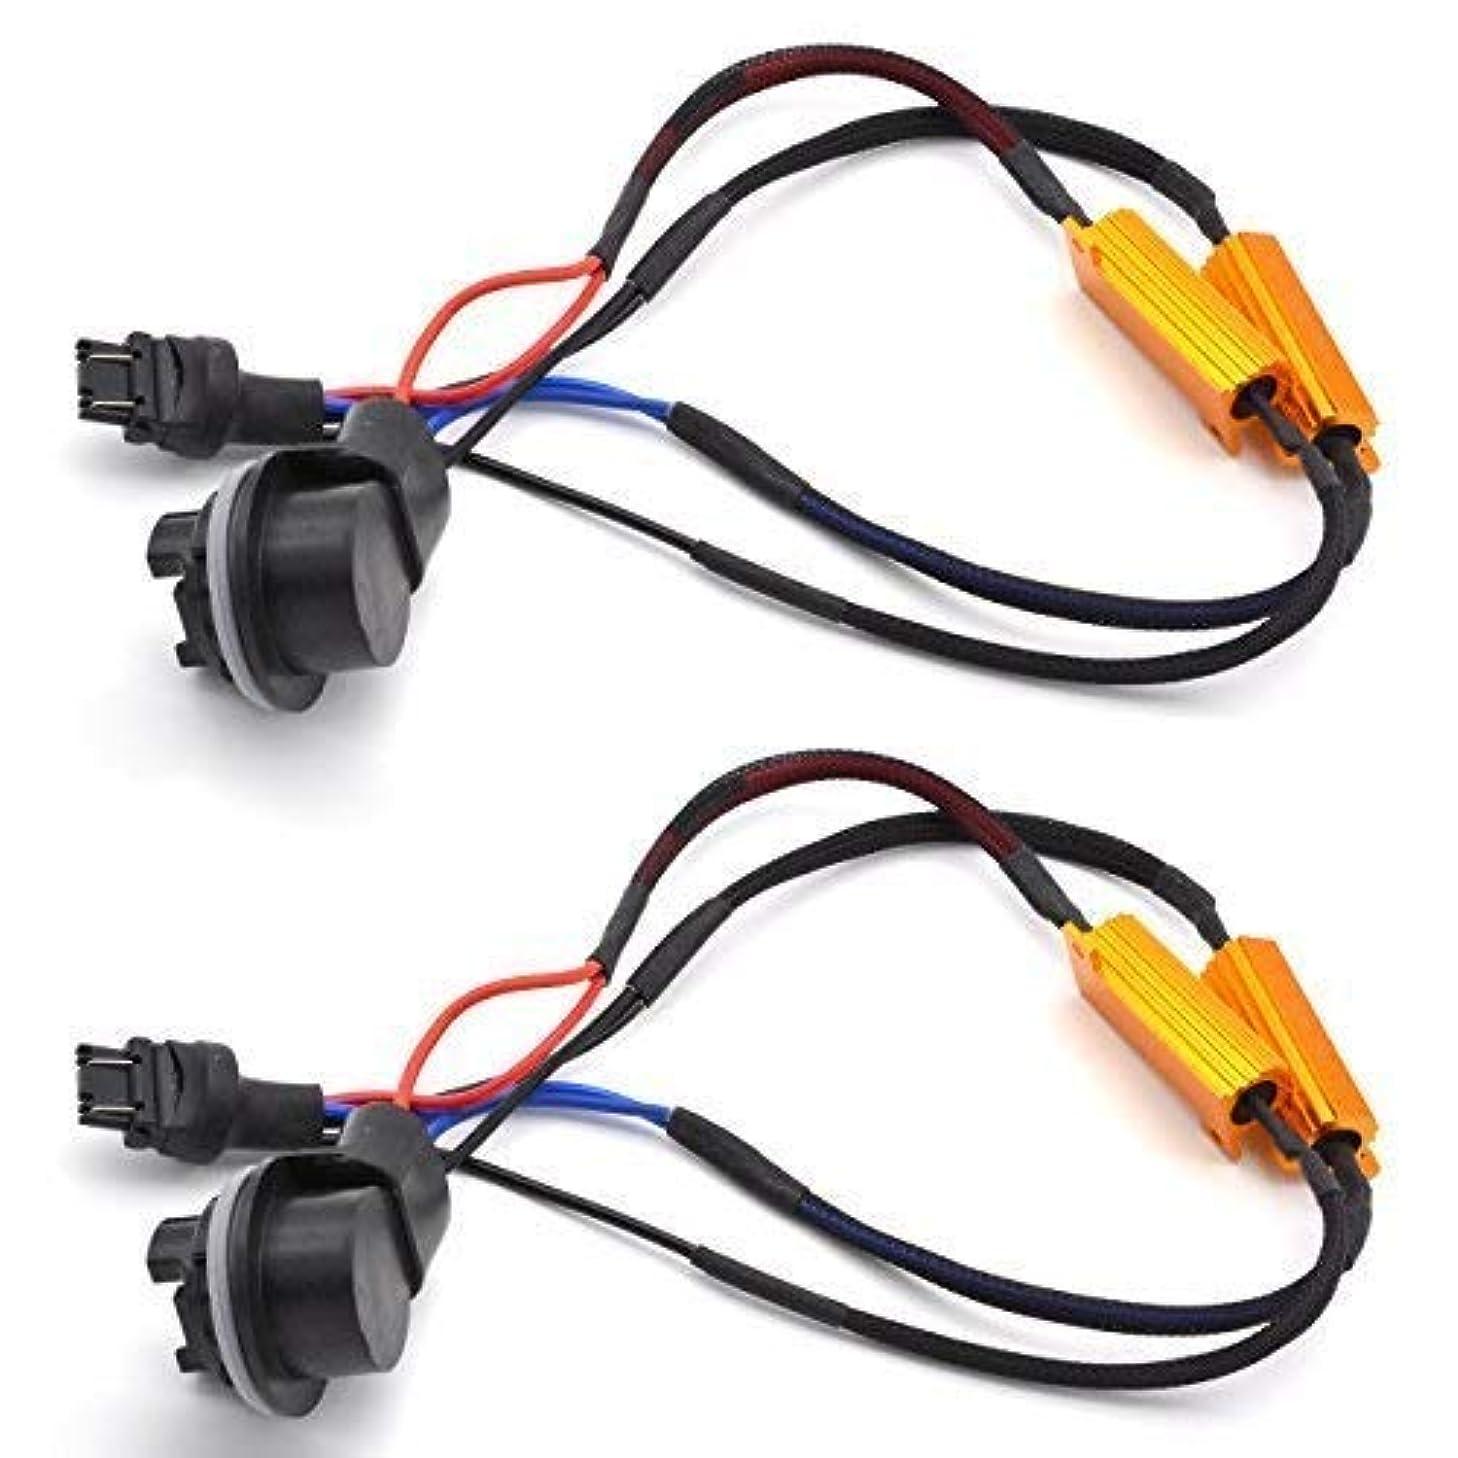 TUINCYN 2pcs 50W 8 ohm 3157 3047 3057 3155 3457 Led Load Resistors - Fix Headlight LED Bulb Fog Lamp Fast Hyper Flash Turn Signal Blink Light Error Code Canbus Resistors Decoder